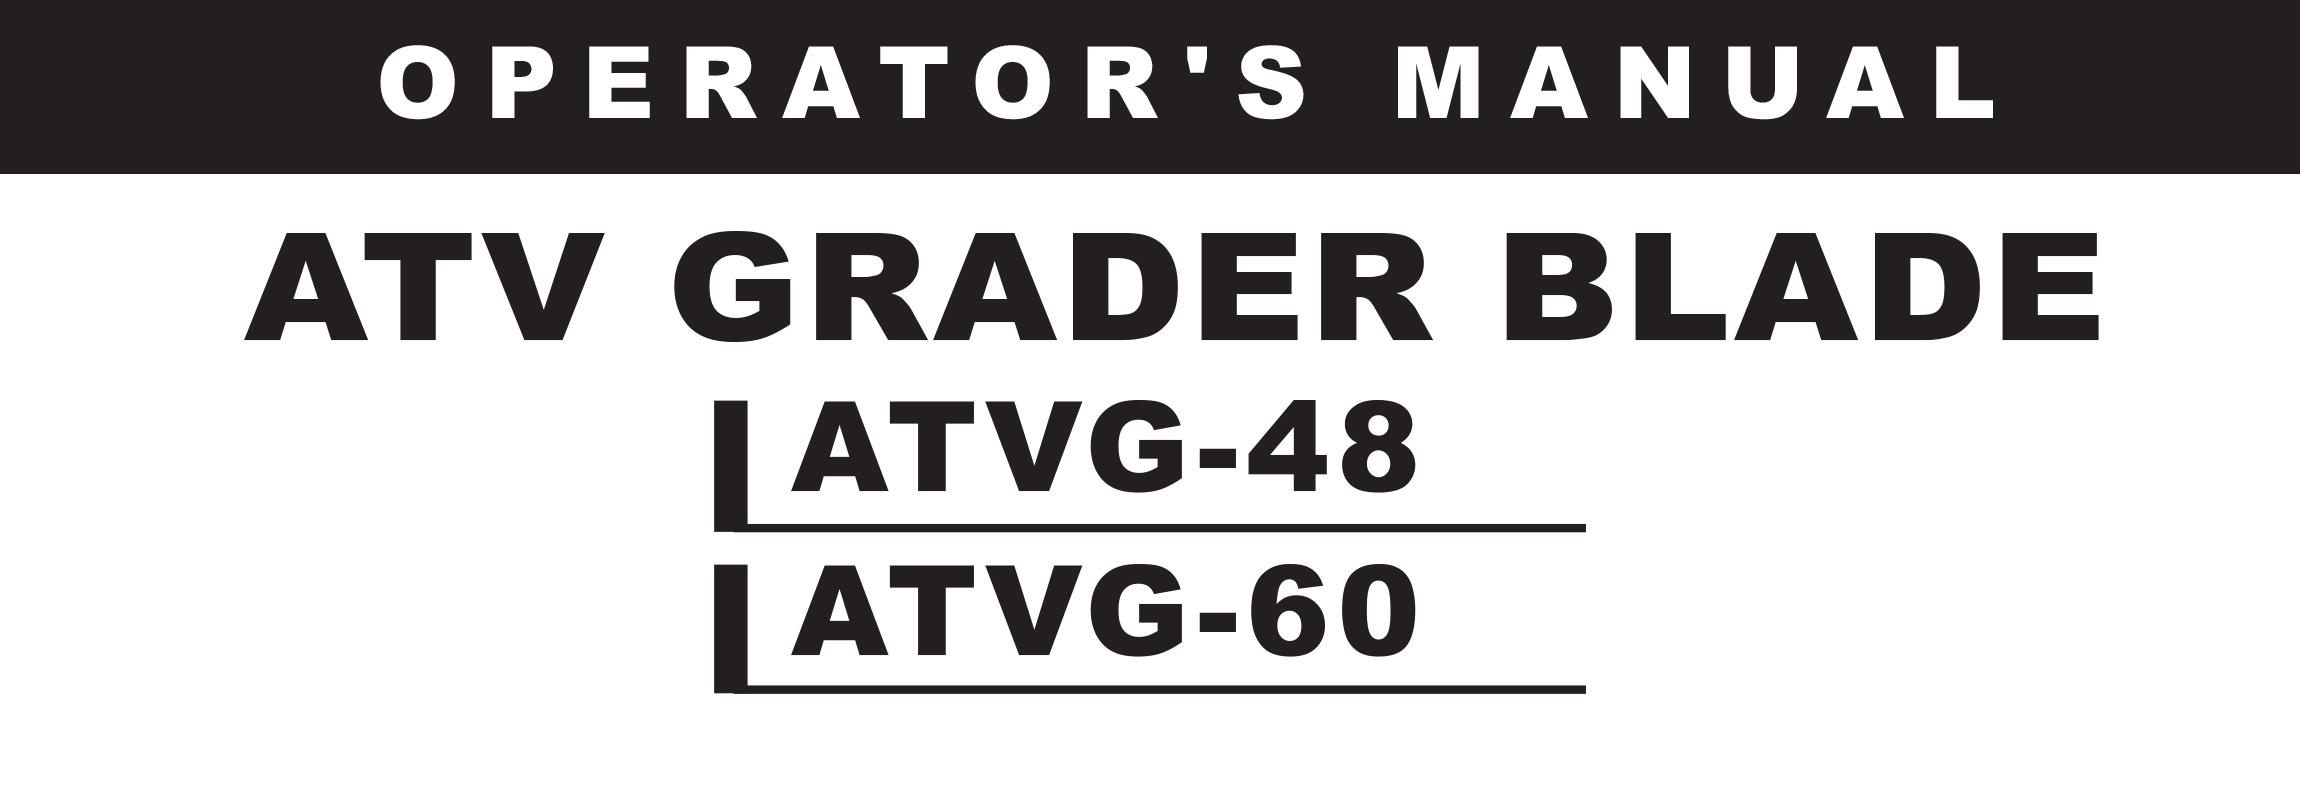 ATVG Series Owners Manual